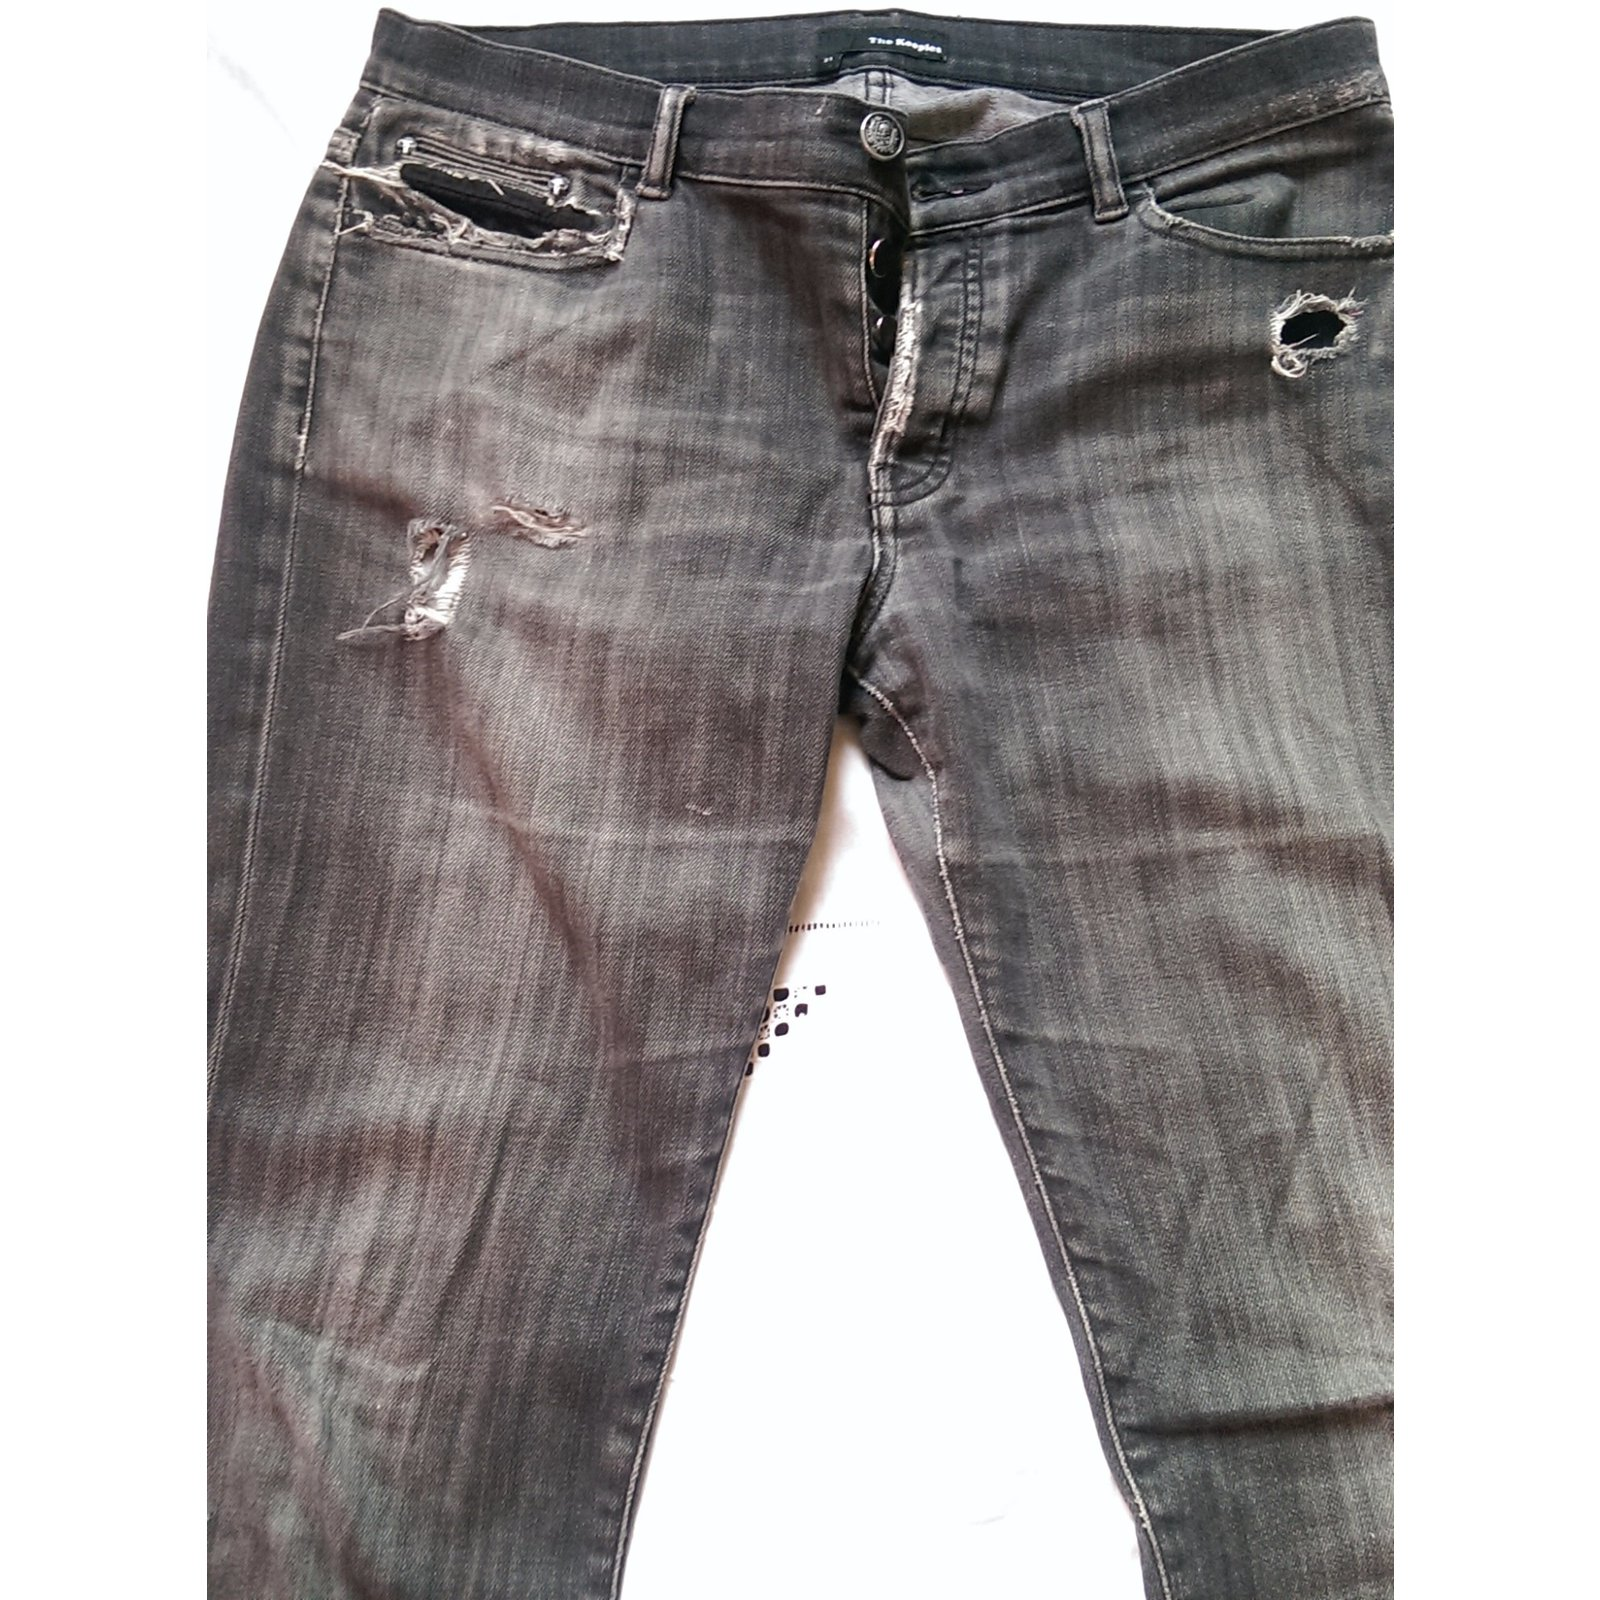 jeans homme the kooples hp216fit coton elasthane gris joli closet. Black Bedroom Furniture Sets. Home Design Ideas